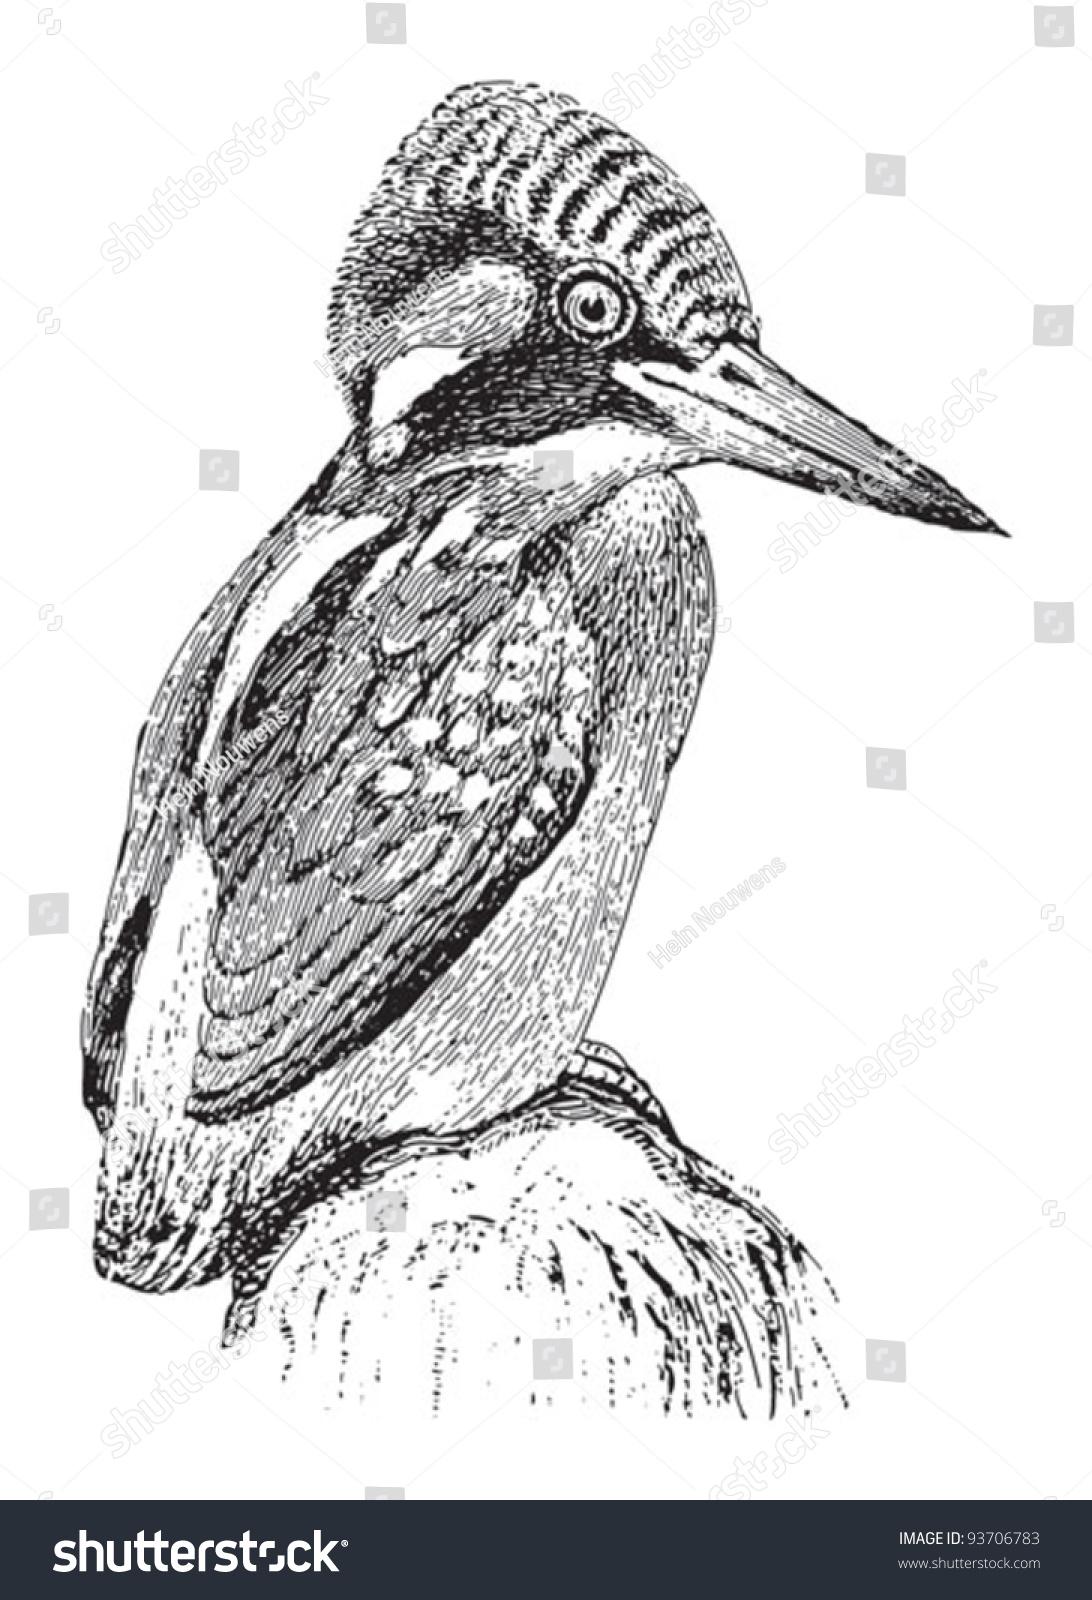 Line Drawing Kingfisher : Common kingfisher alcedo ispida vintage illustration stock